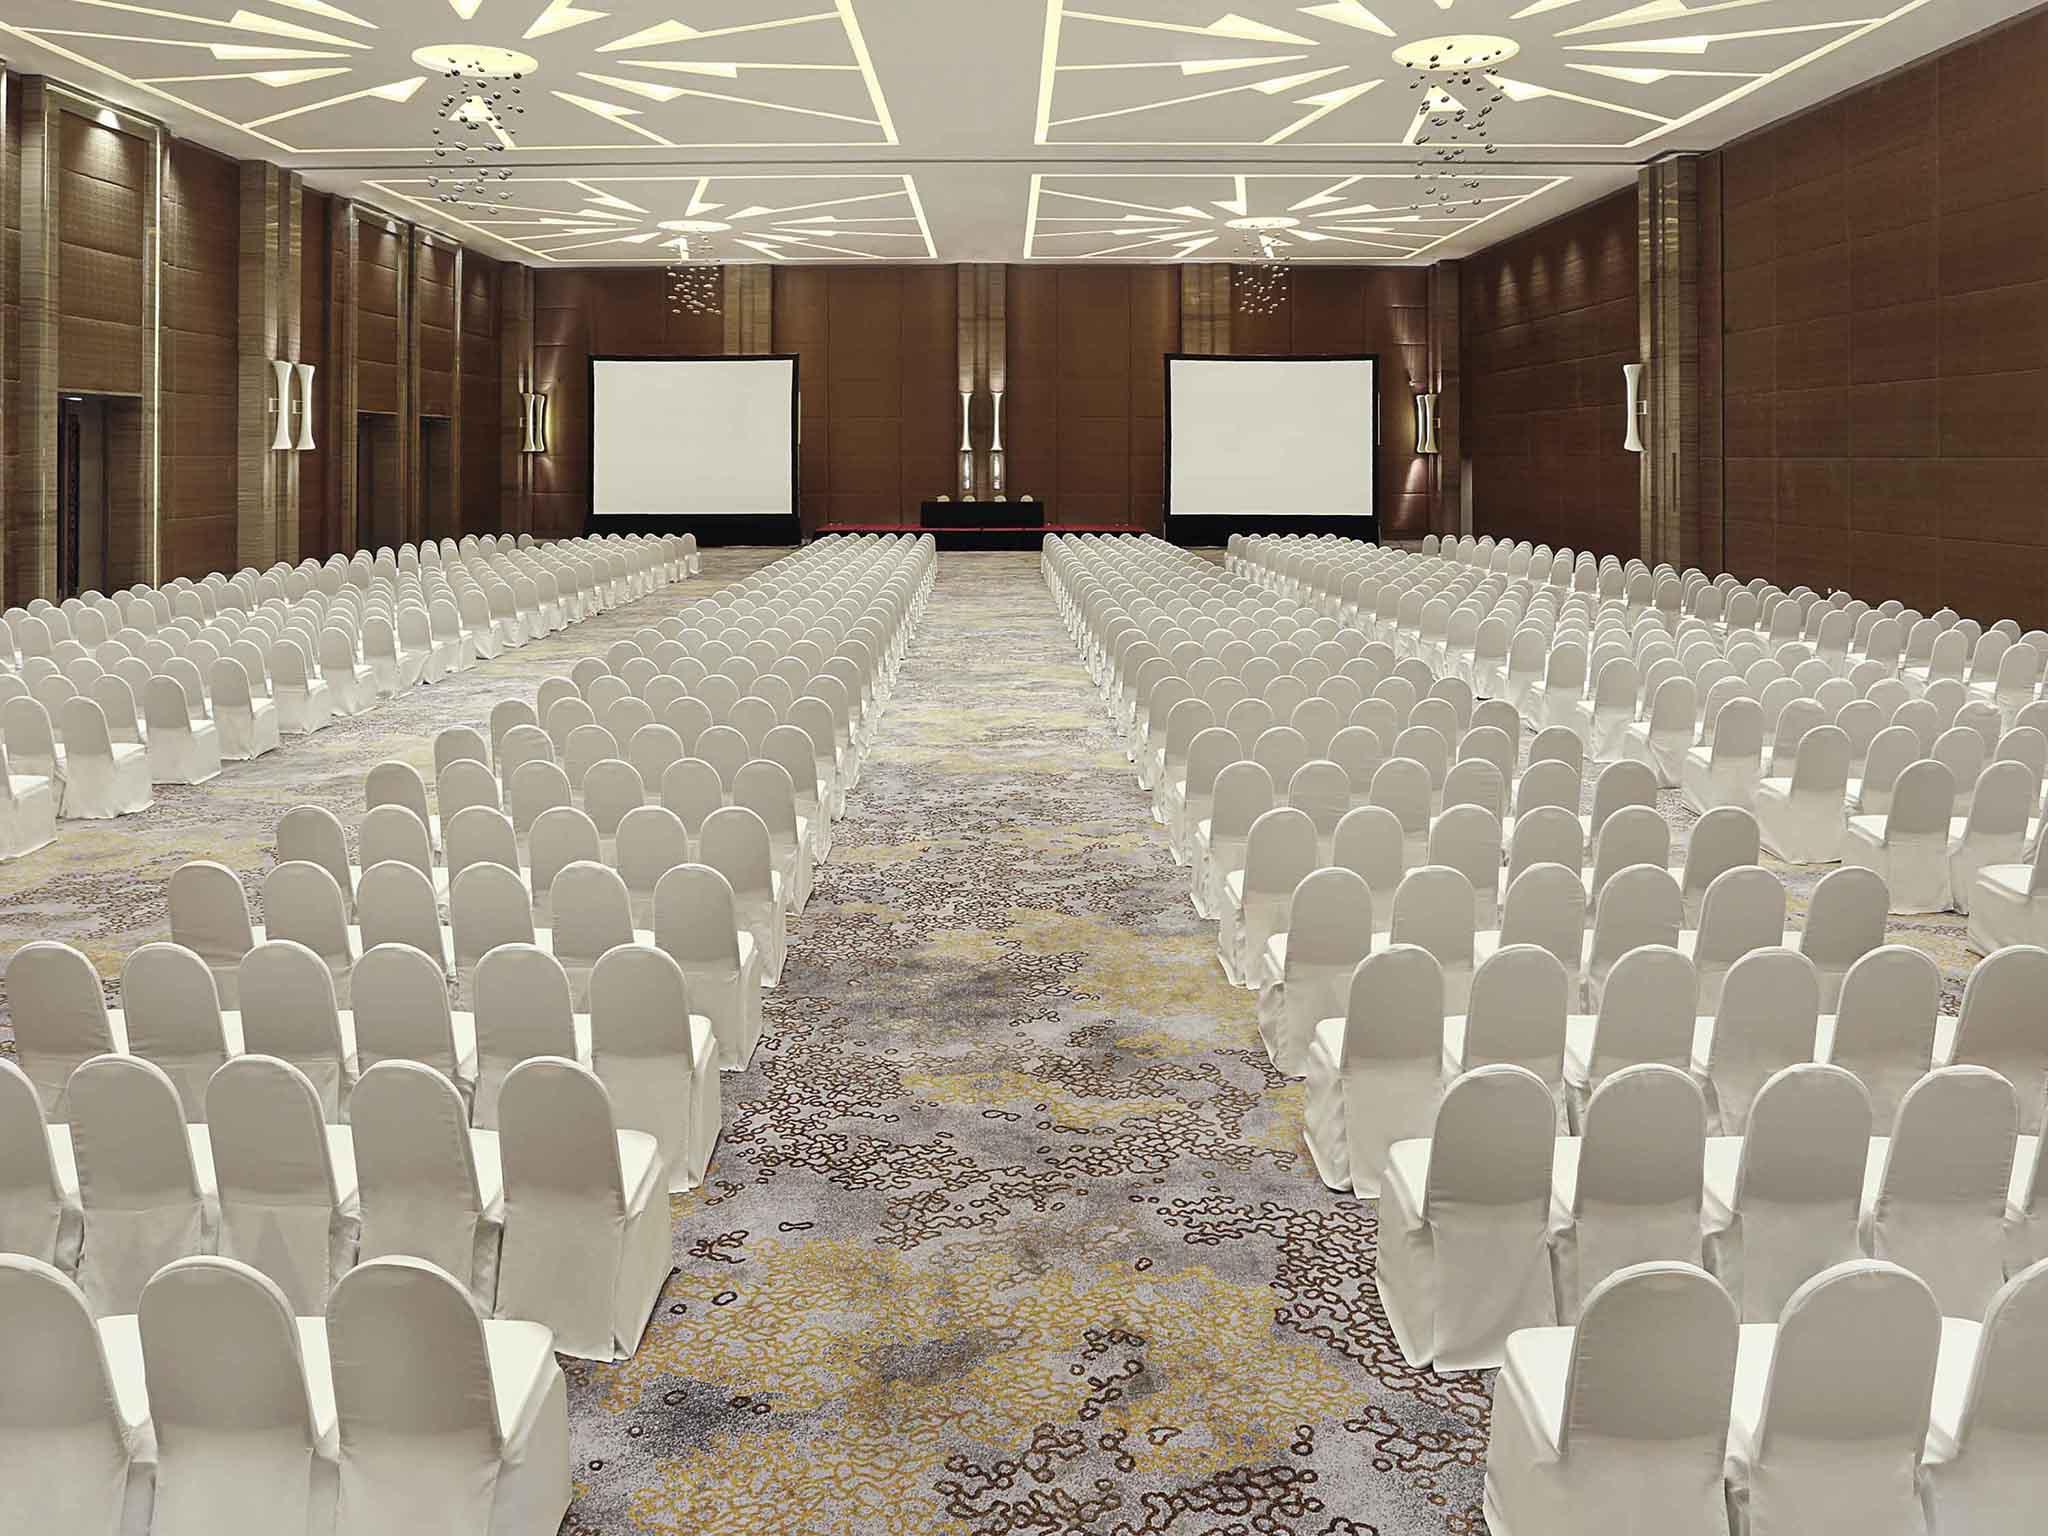 Novotel tangerang business leisure hotel in tangerang meetings and events novotel tangerang junglespirit Images